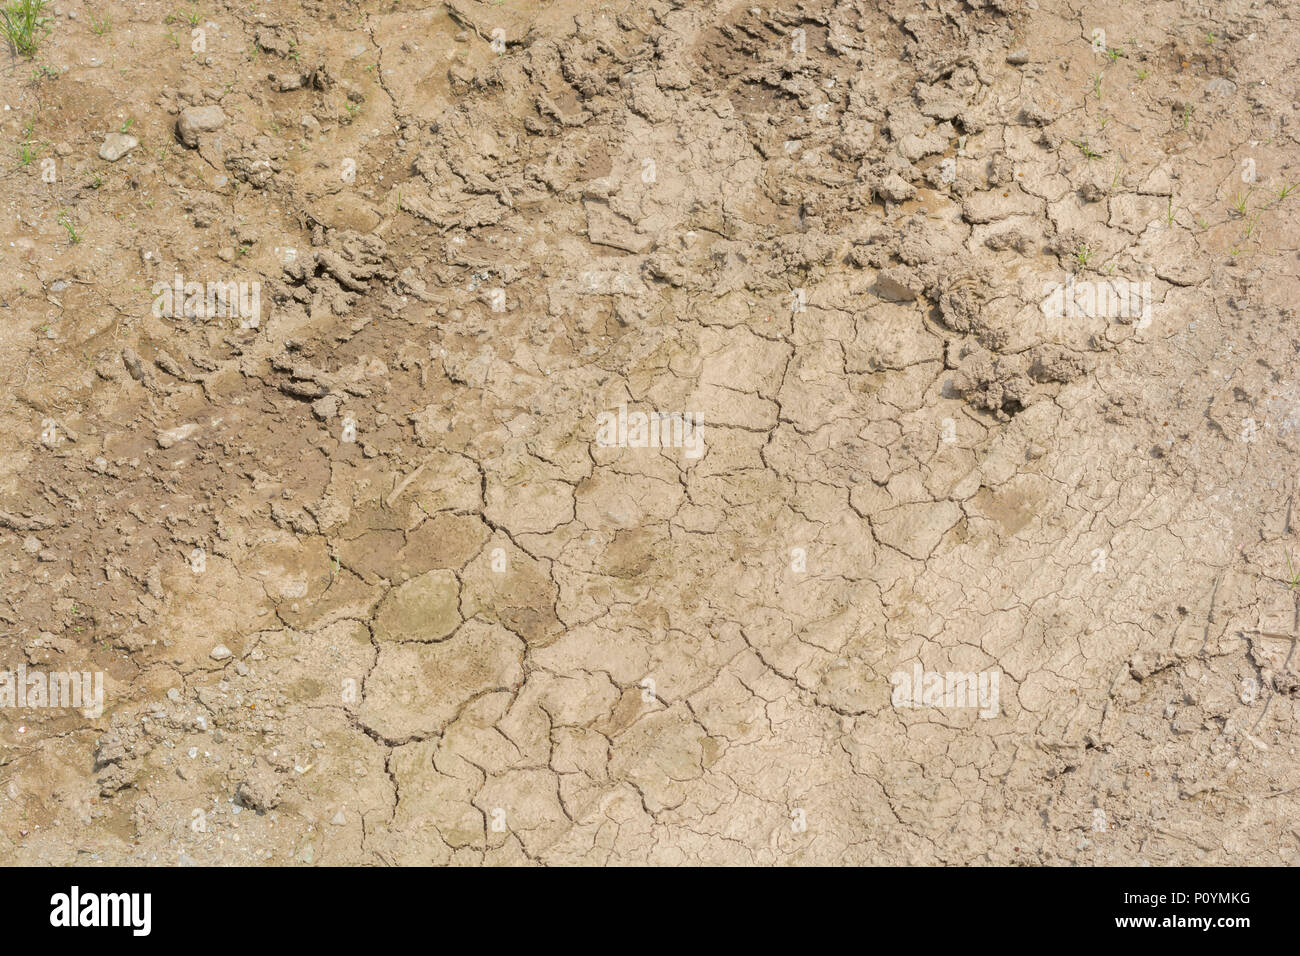 Patch of parched soil - metaphor for failing crops, crop losses, famine, starvation, heatwave concept, heatwave crops, water crisis Denmark drought. - Stock Image